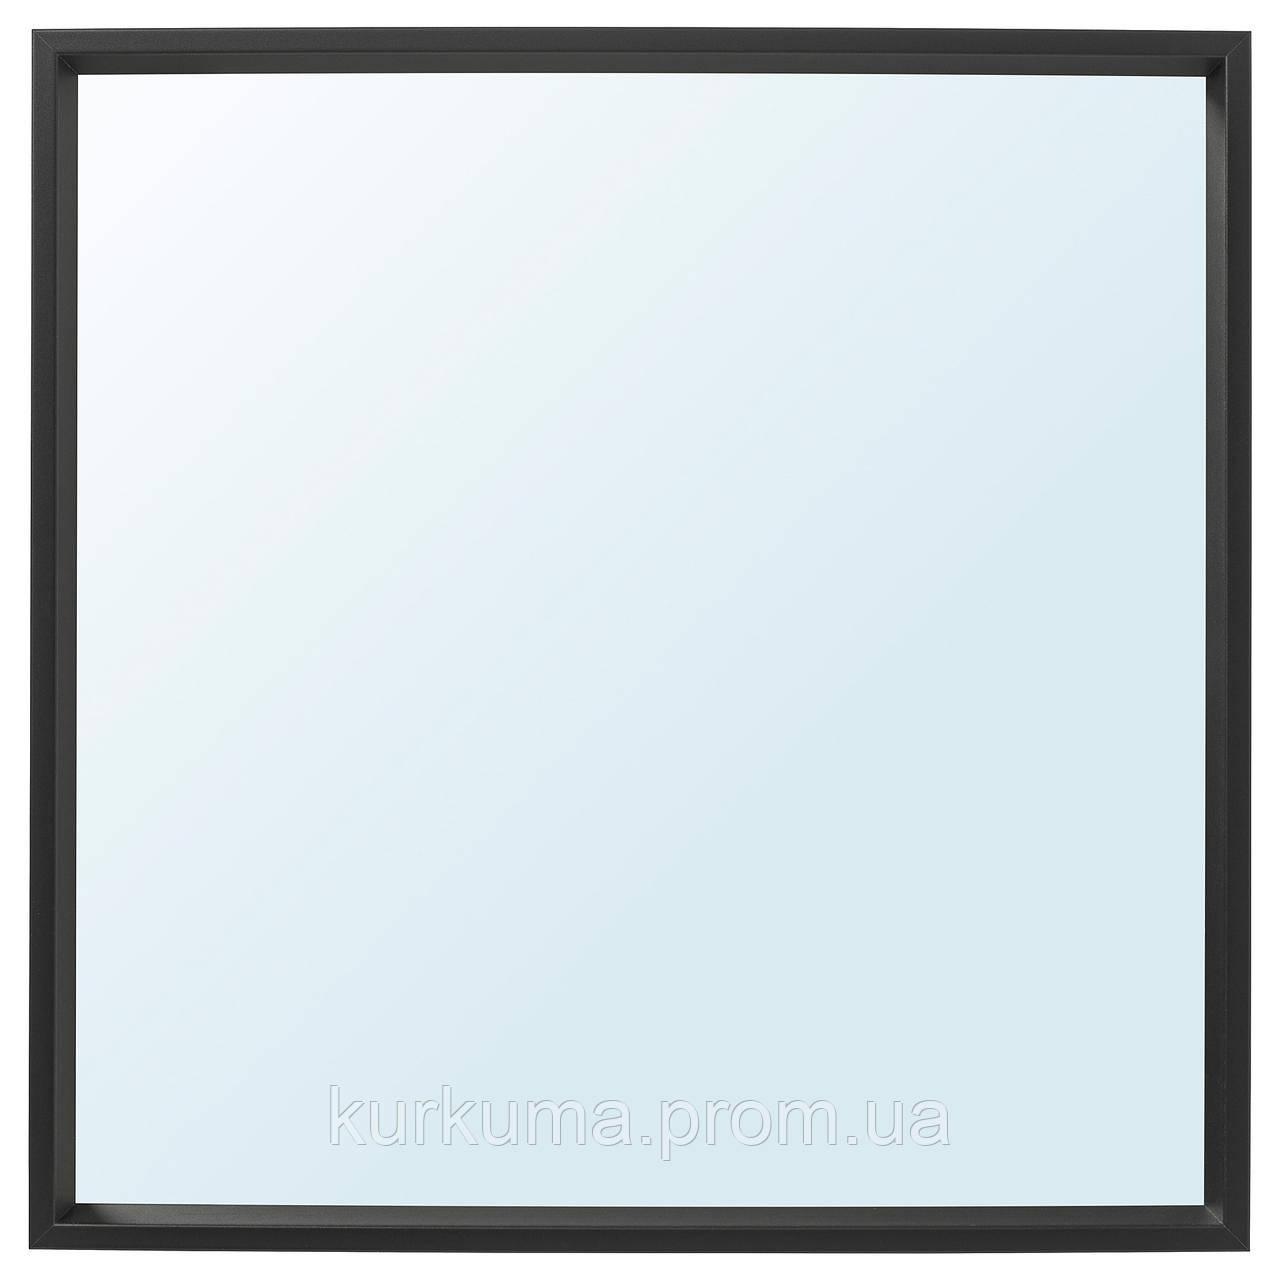 IKEA NISSEDAL Зеркало, черное  (503.203.20)